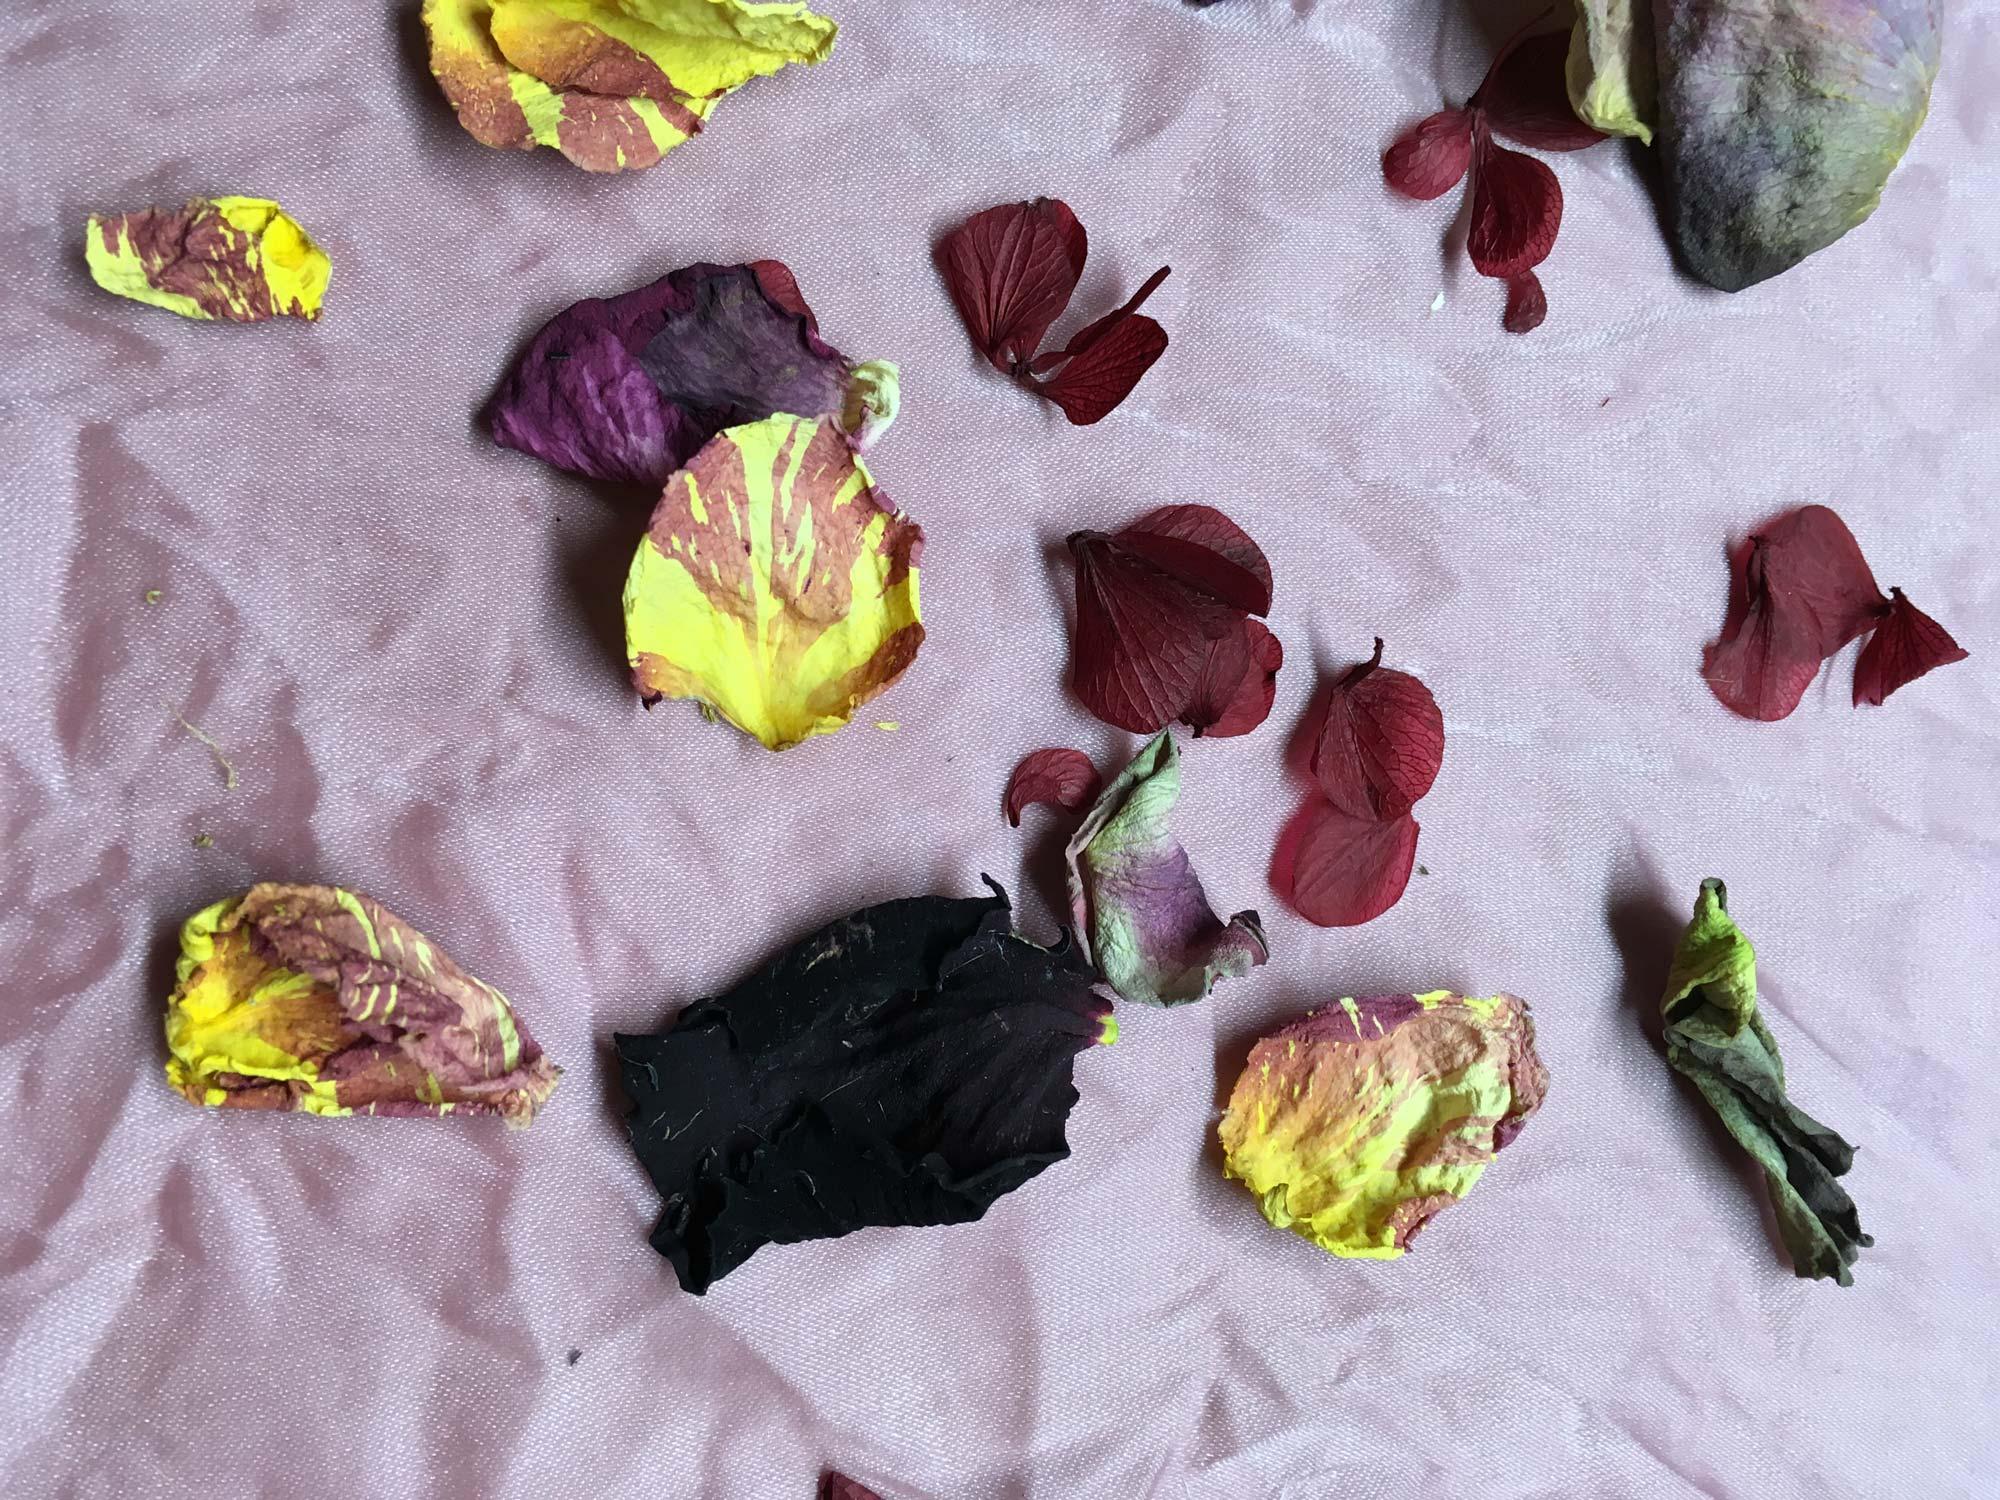 koebenhavns-plantefarveri-flowerscape-collection-detail_web.jpg